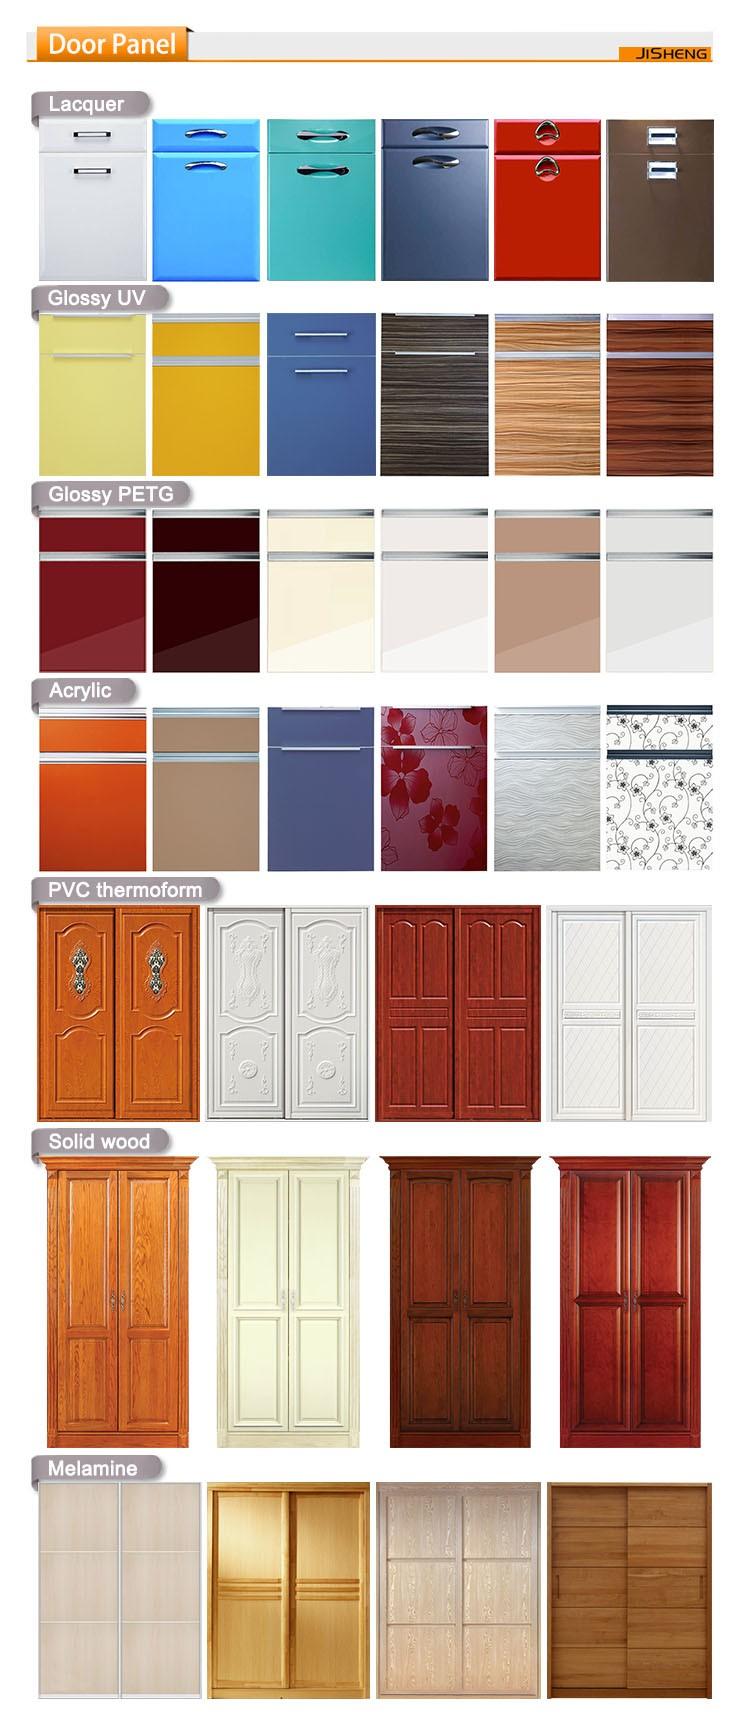 Melamine Bedroom Furniture Double Color Wardrobe Design Wardrobe System Furniture Bedroom